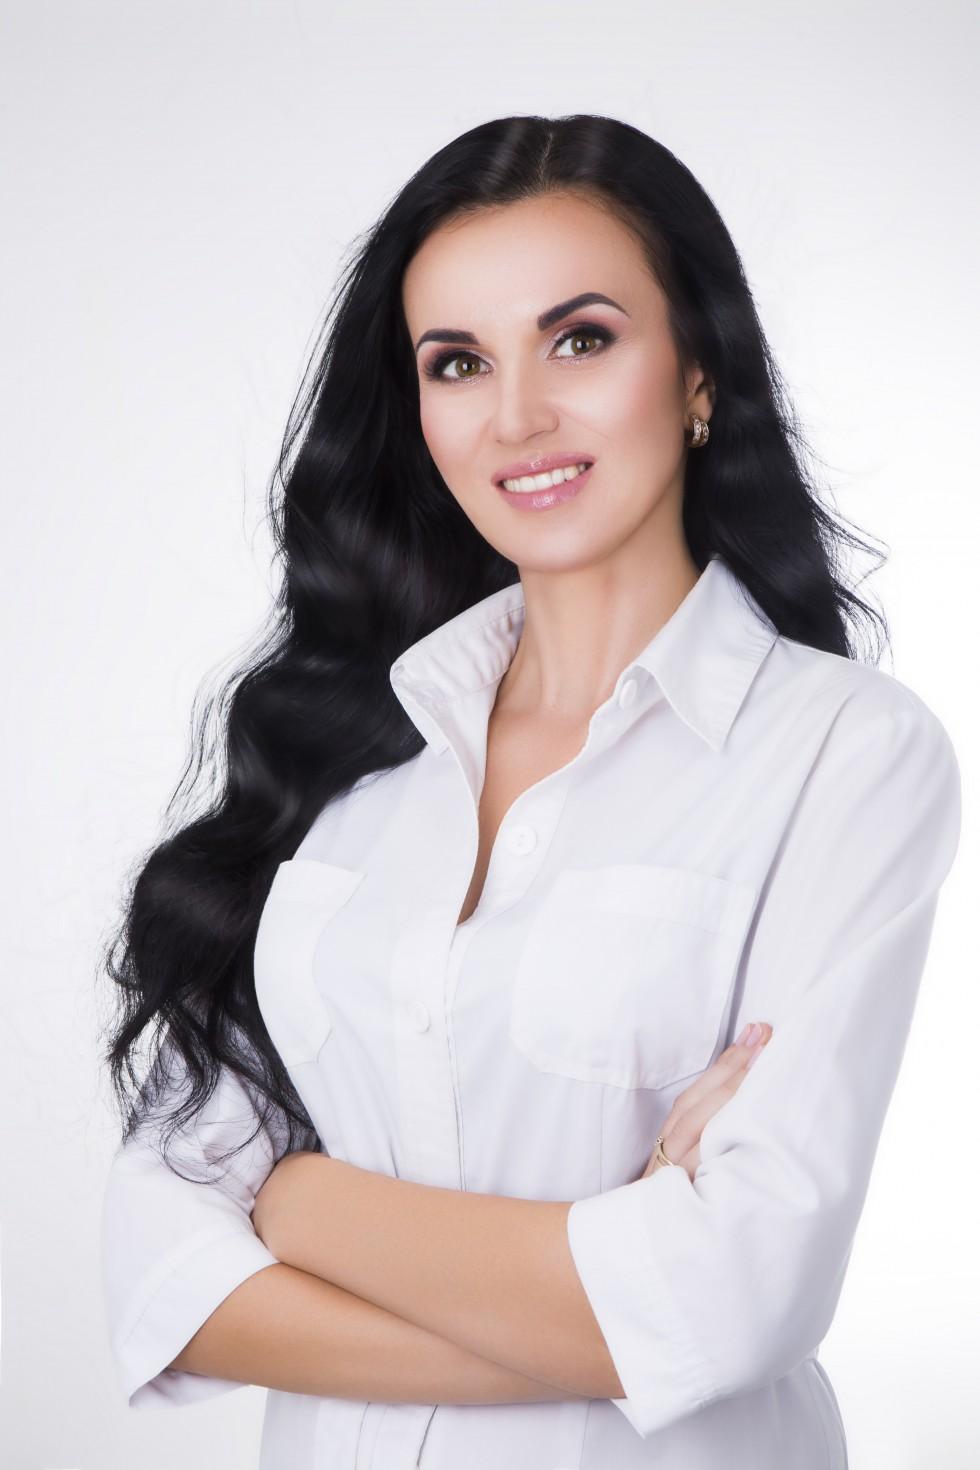 Світлана Мельник, дерматолог-косметолог